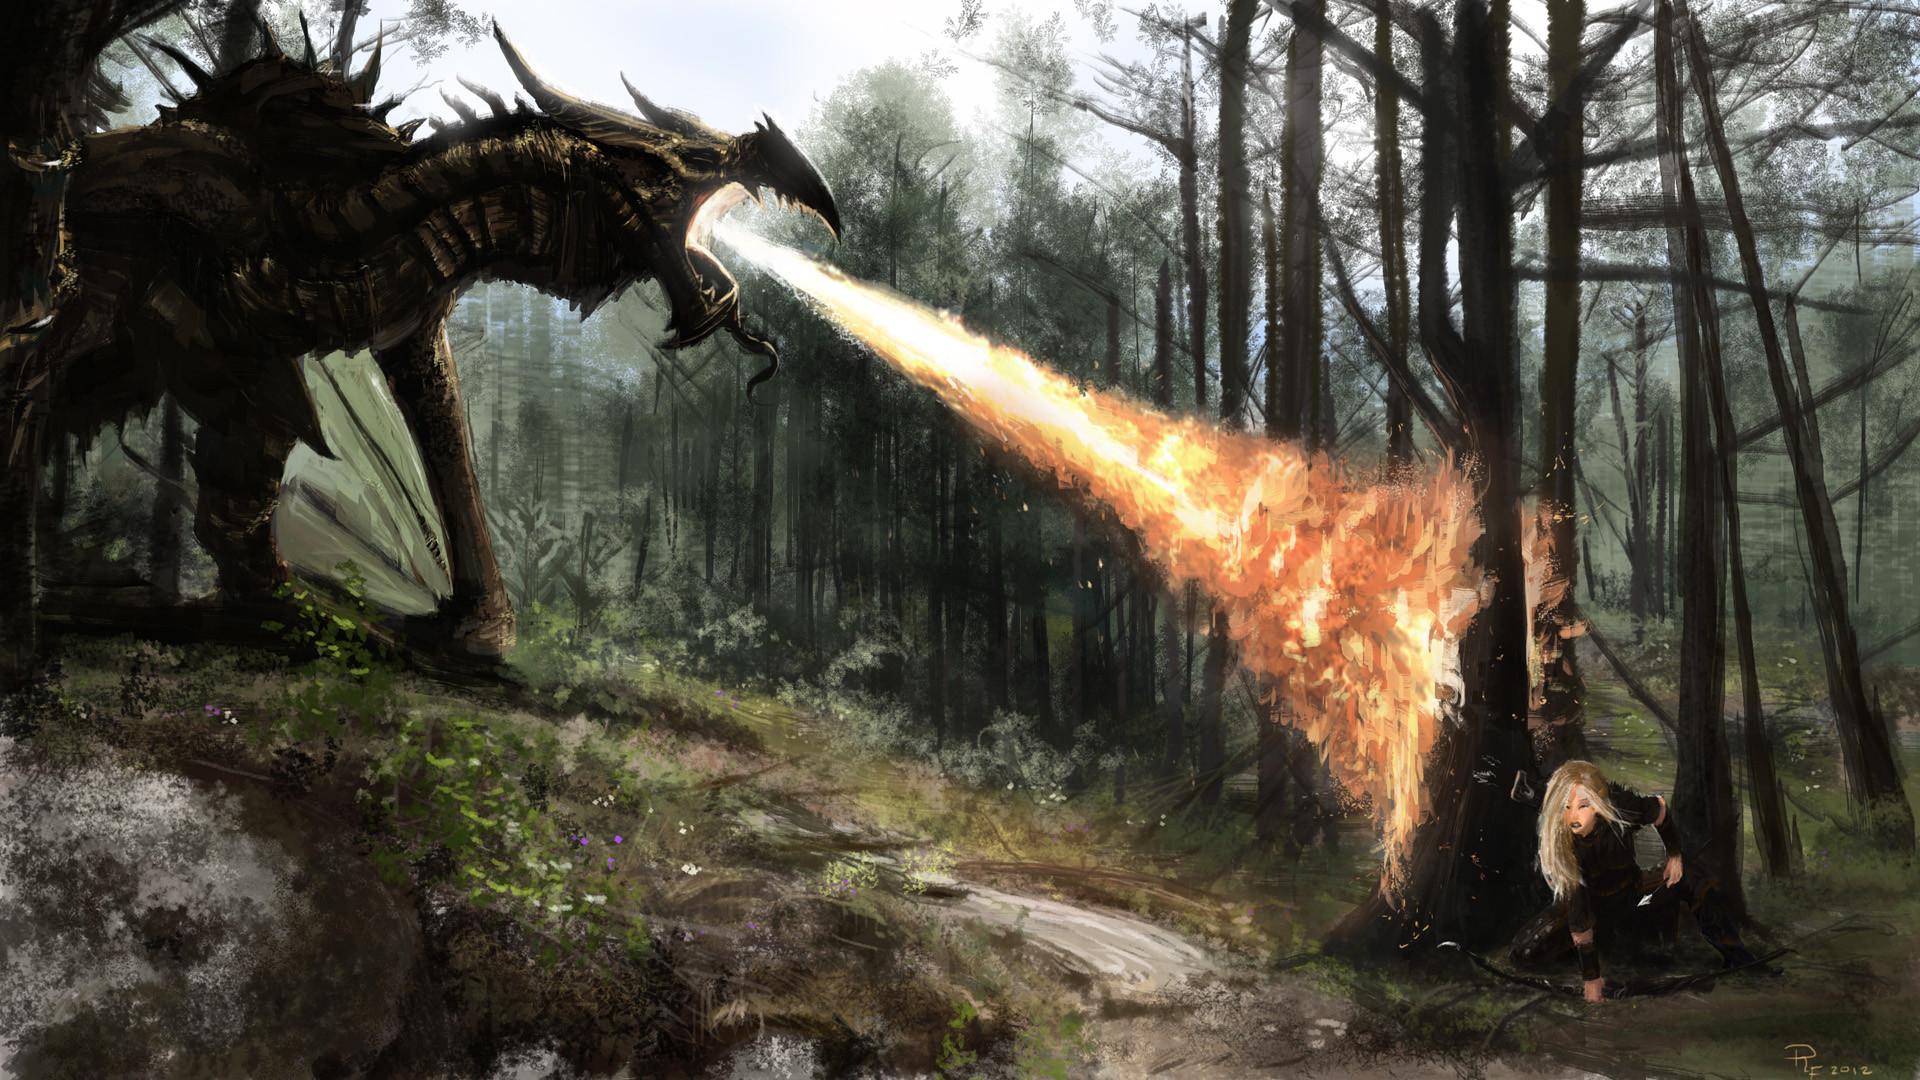 Jeux Vid̩o РThe Elder Scrolls V: Skyrim Skyrim Guerrier(̬re) The Elder